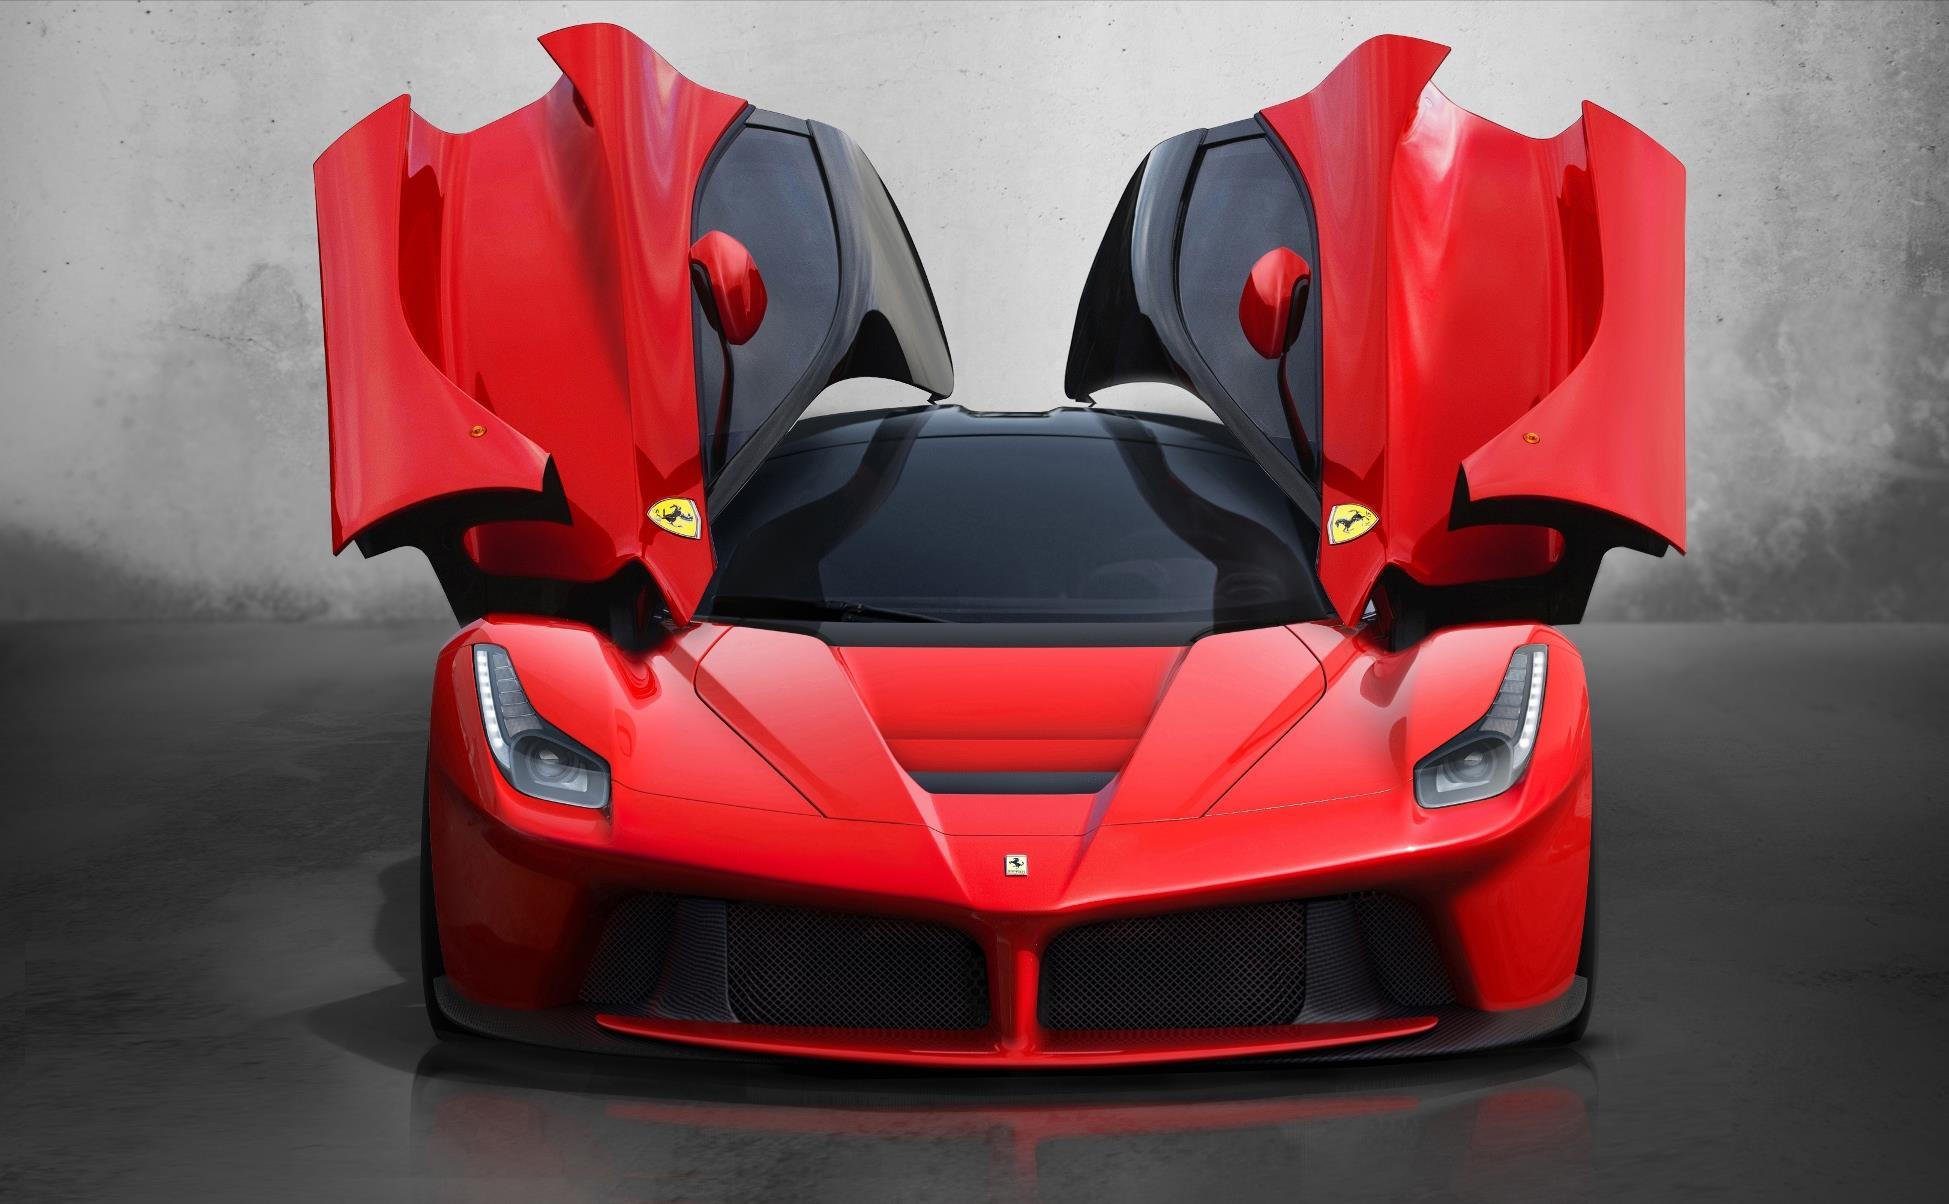 LaFerrari: Ferrari's new 950bhp flagship revealed